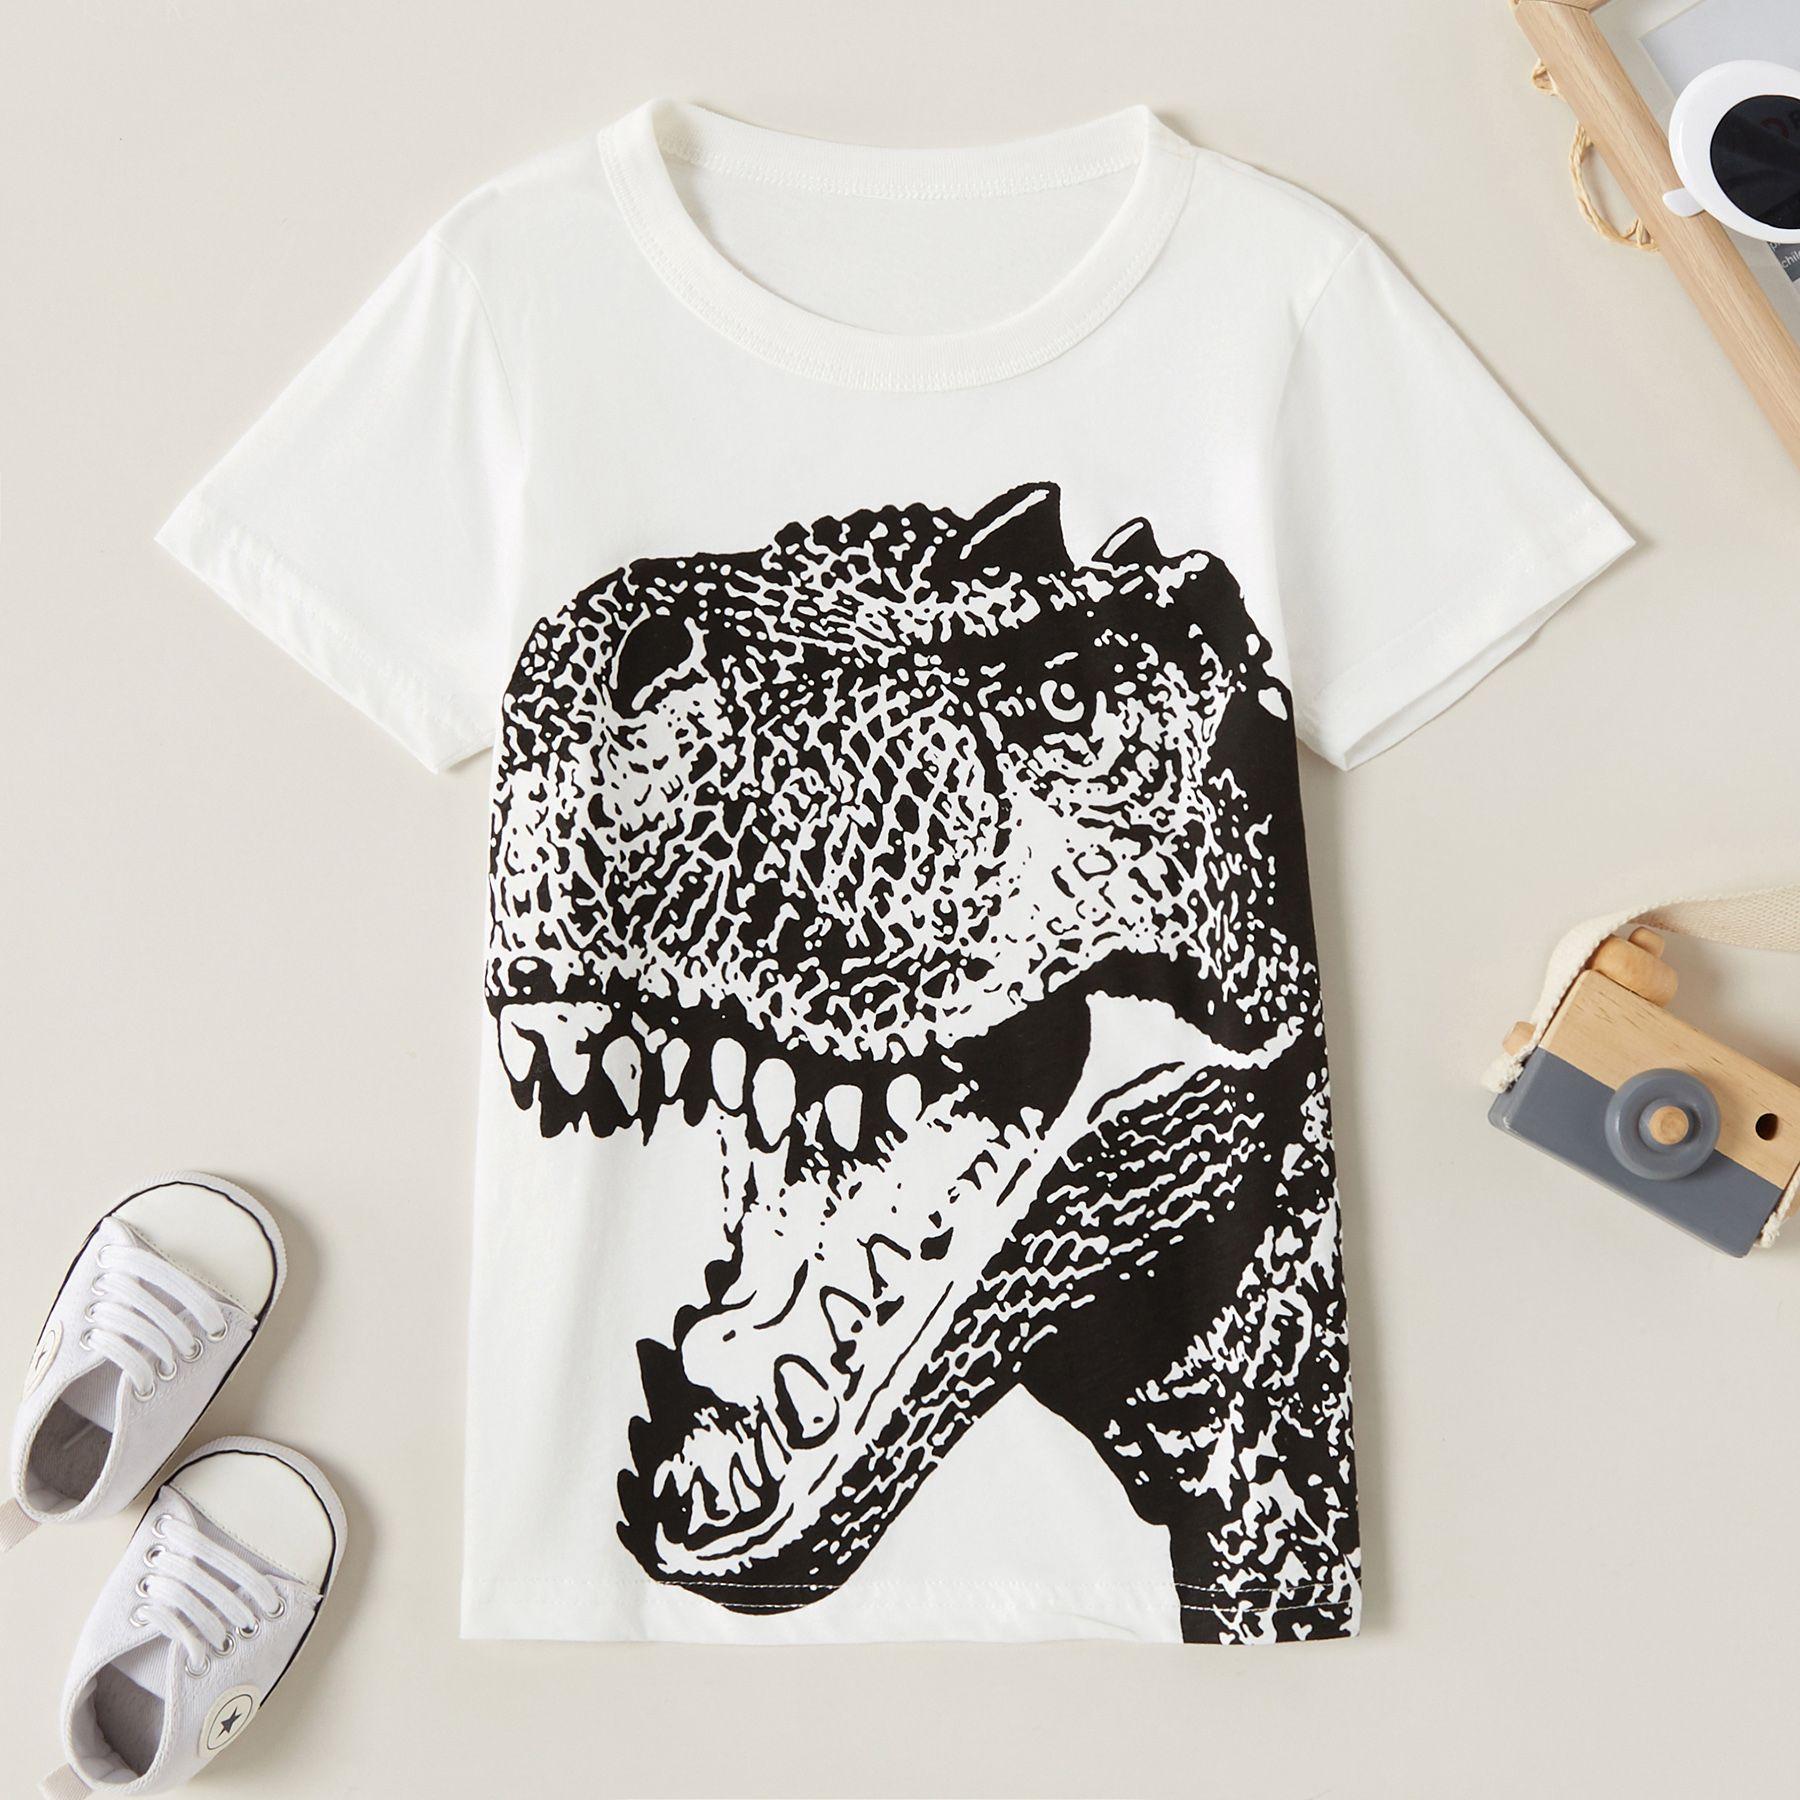 Roar Childrens Summer Short Sleeve Printing T-Shirts